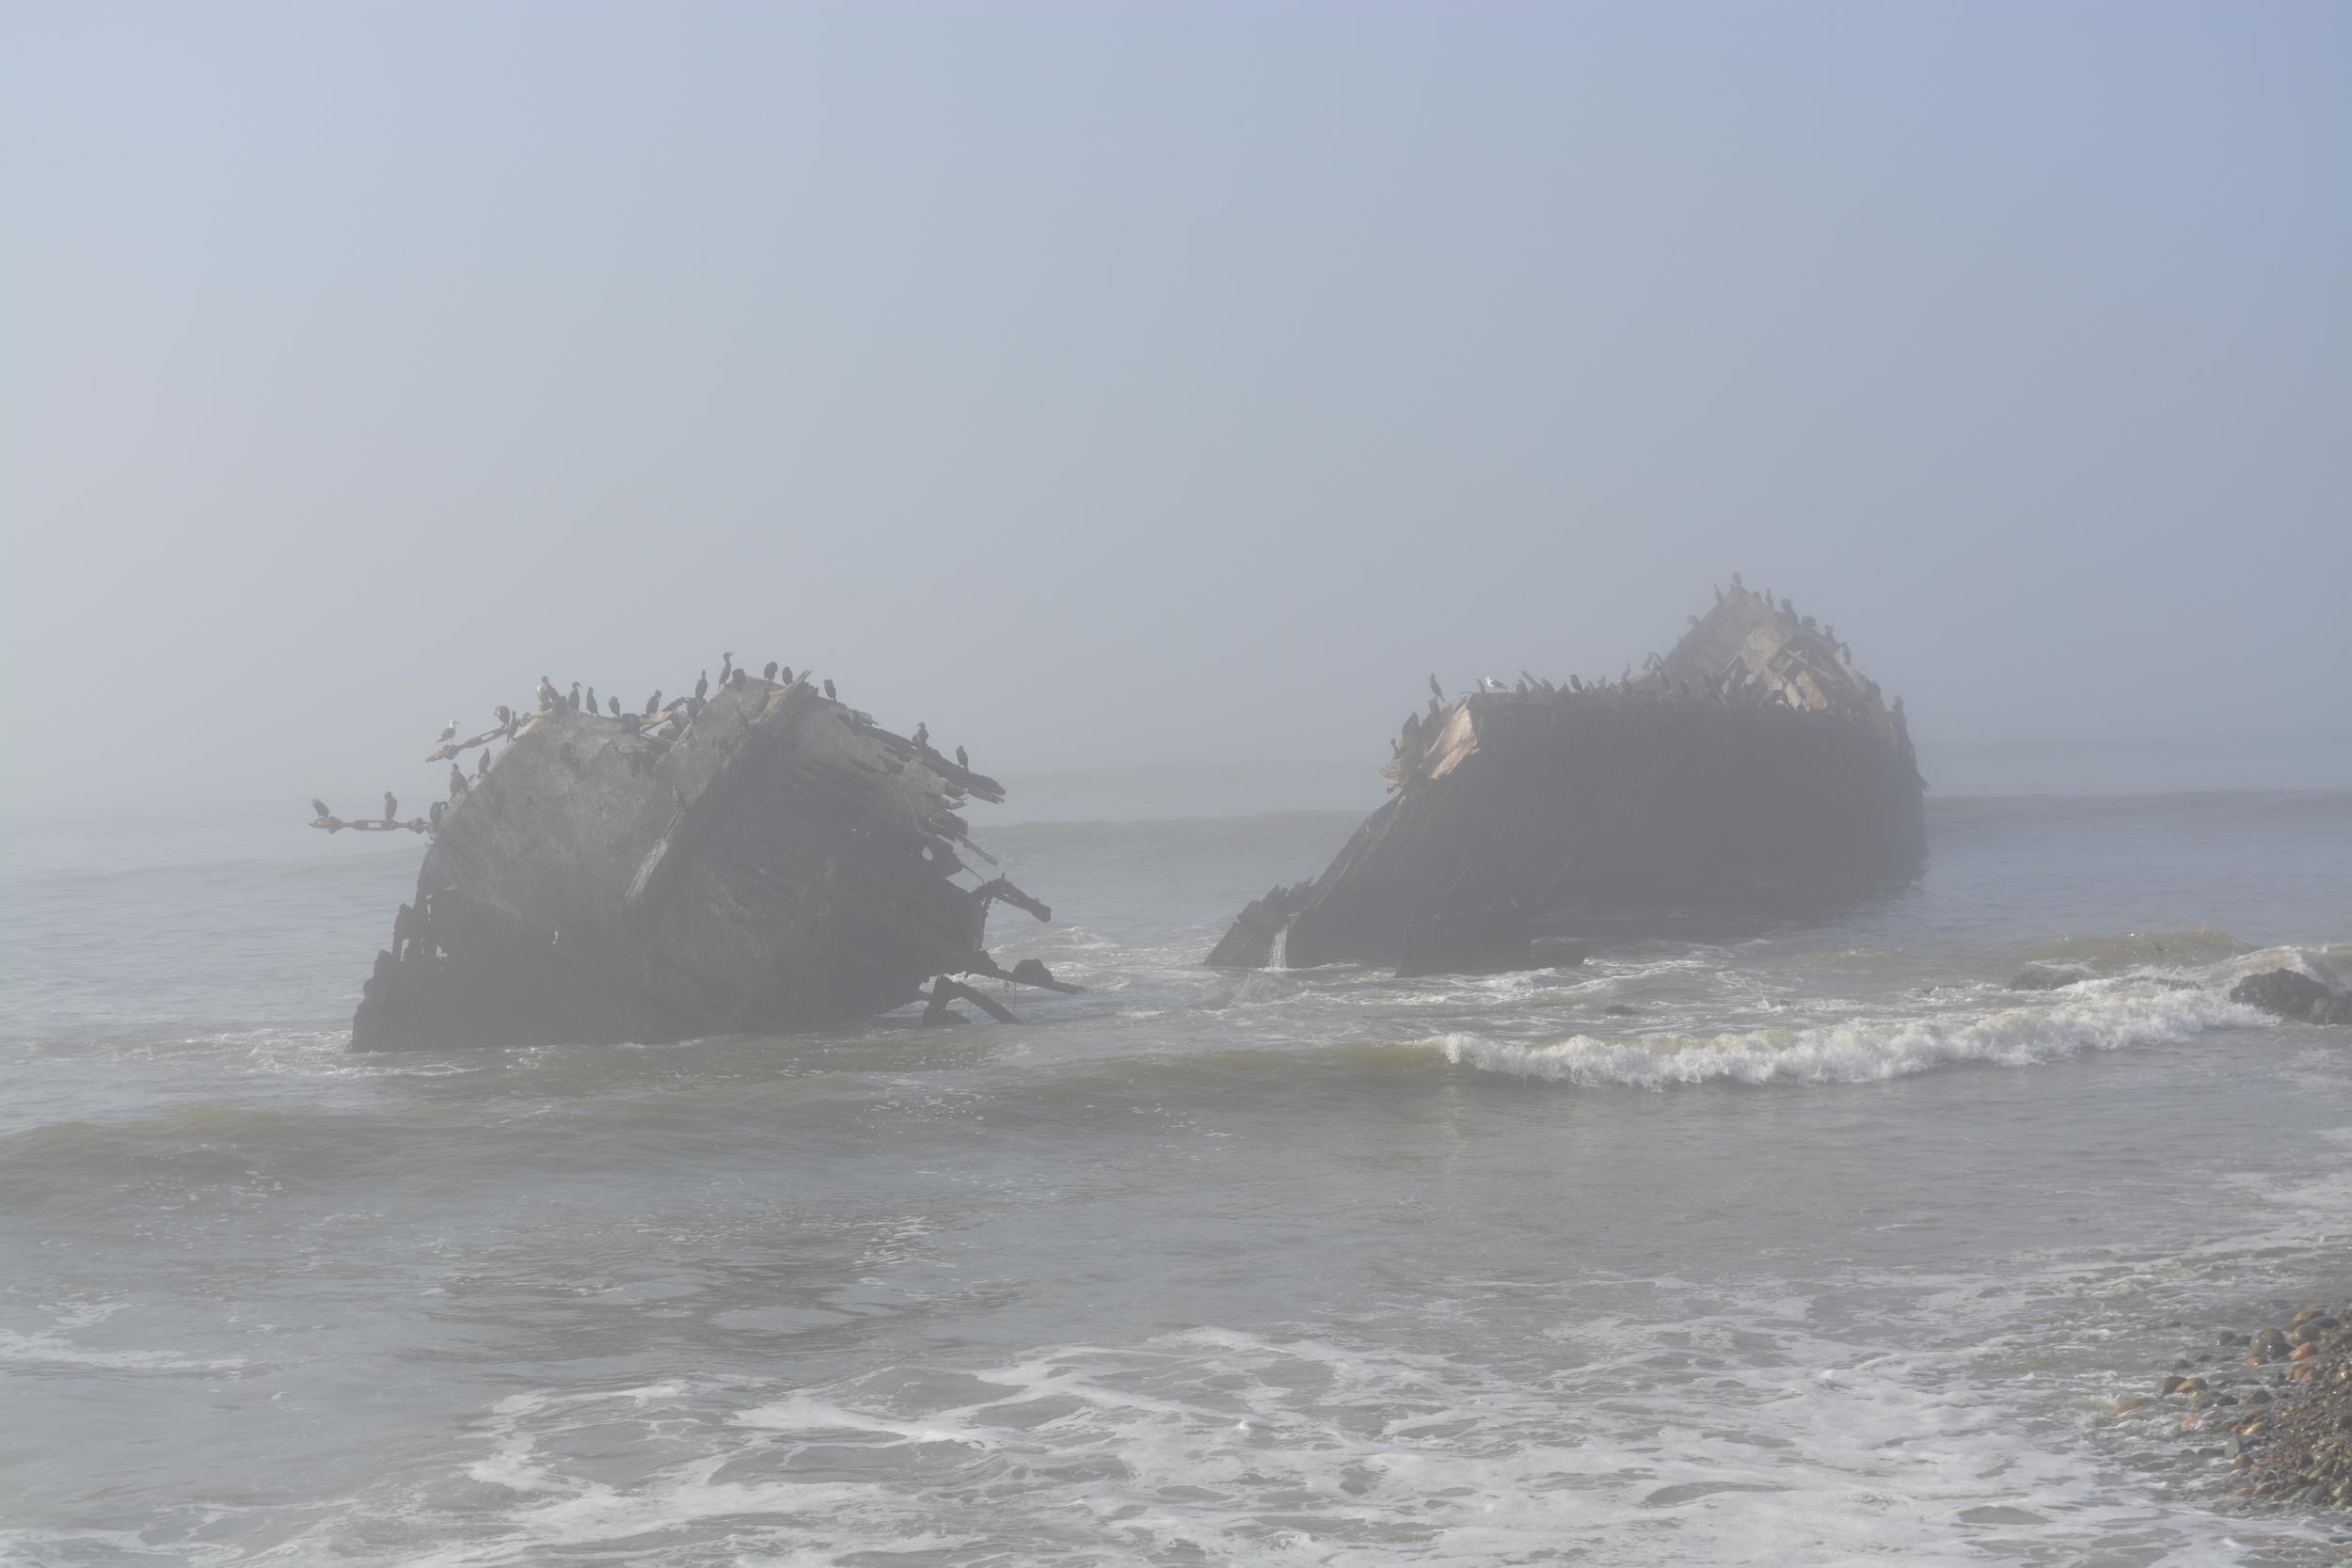 Baja California 10-5-13 Shipwrecks Surfing Adventure Ocean Experience Surf School San Diego (31).JPG